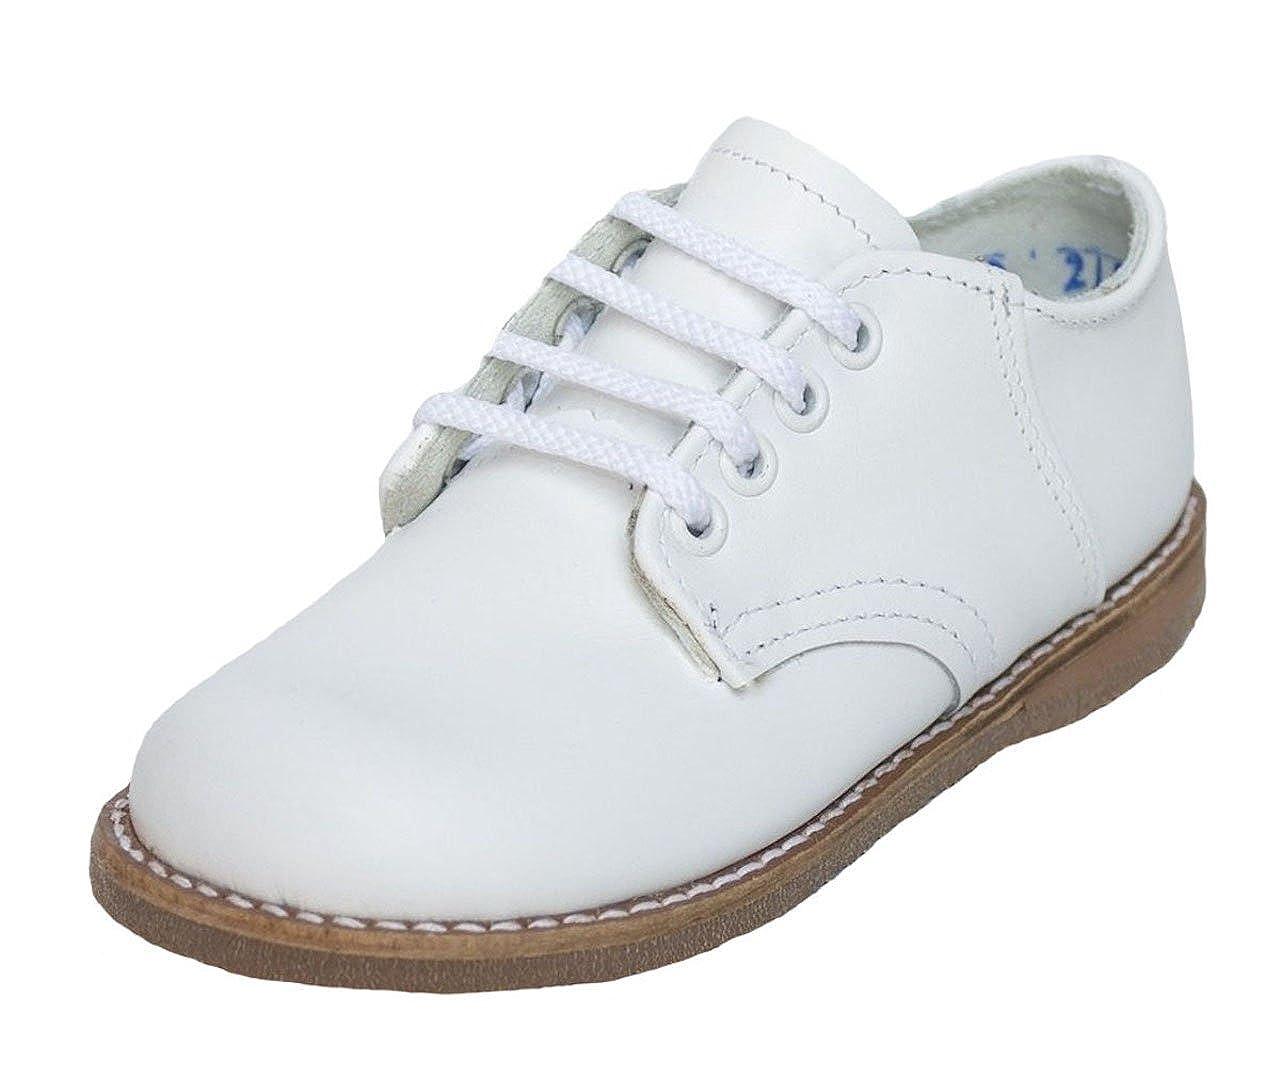 Amilio Toddler's/Kid's Leather Saddle Shoe/Oxford - Chris